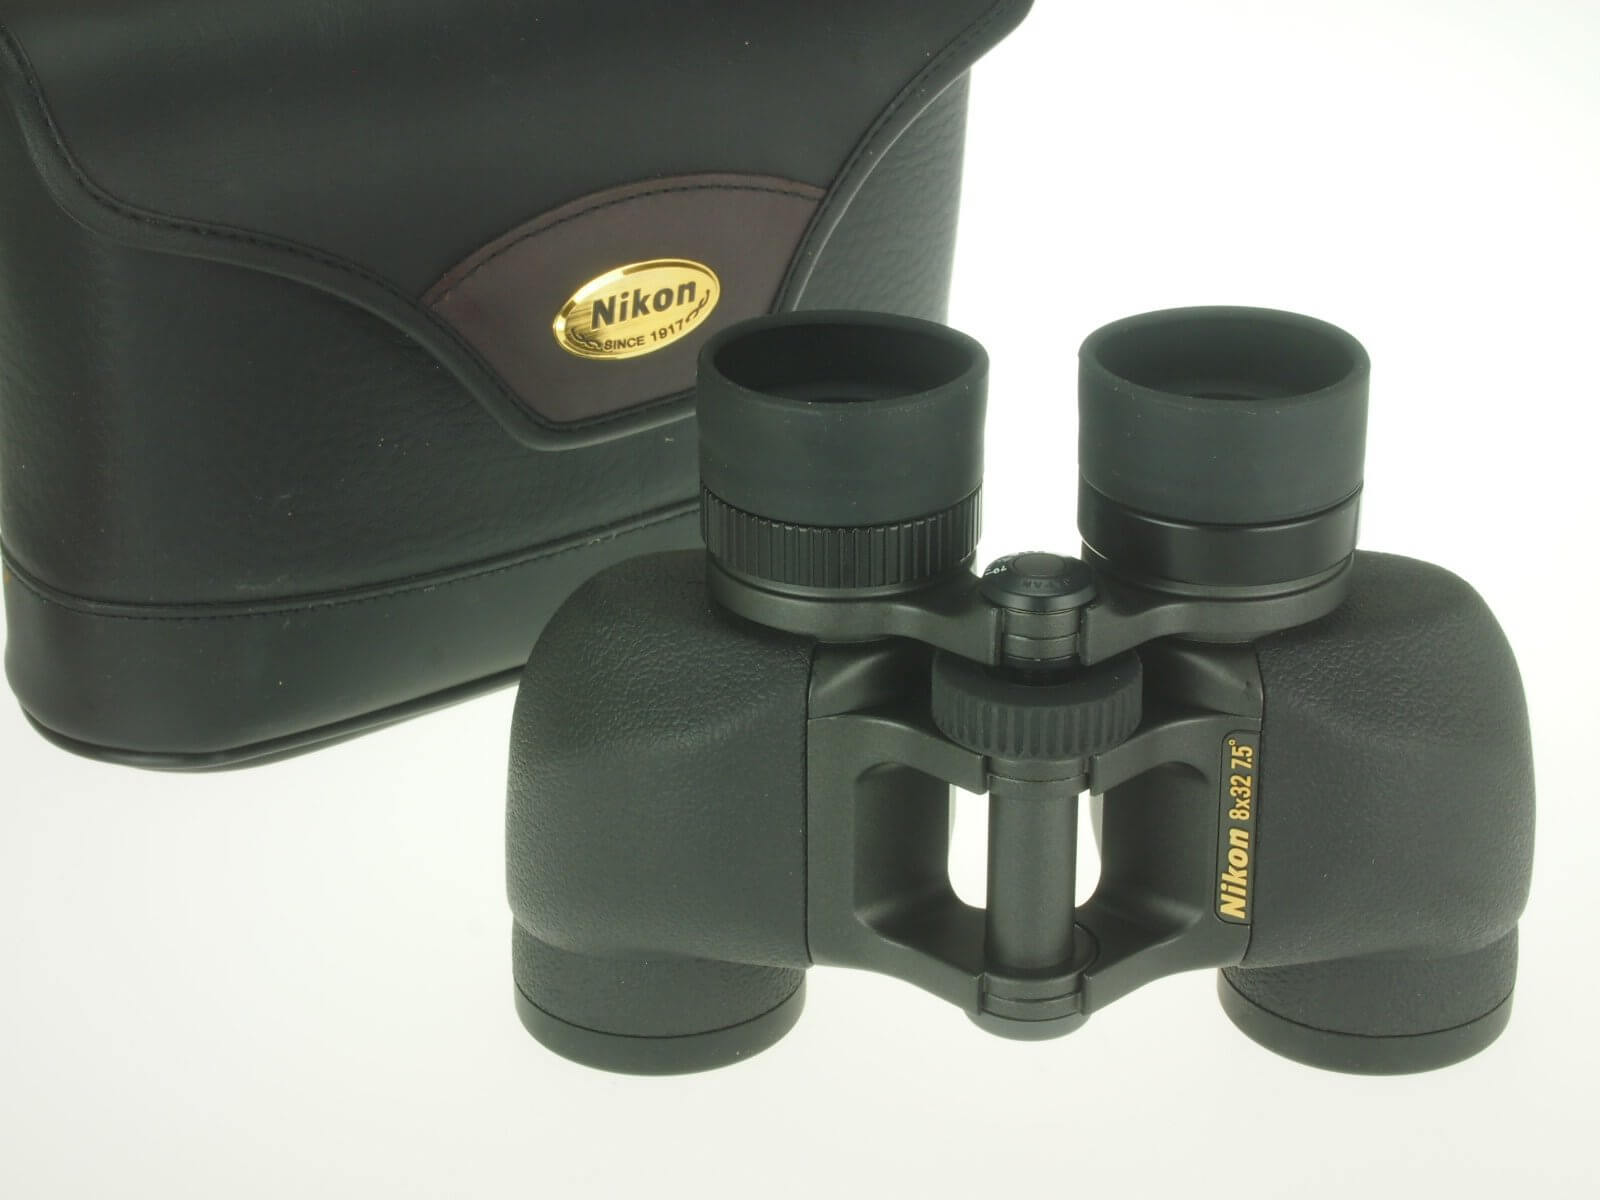 Nikon 8 x 32 SE binoculars, gorgeous!